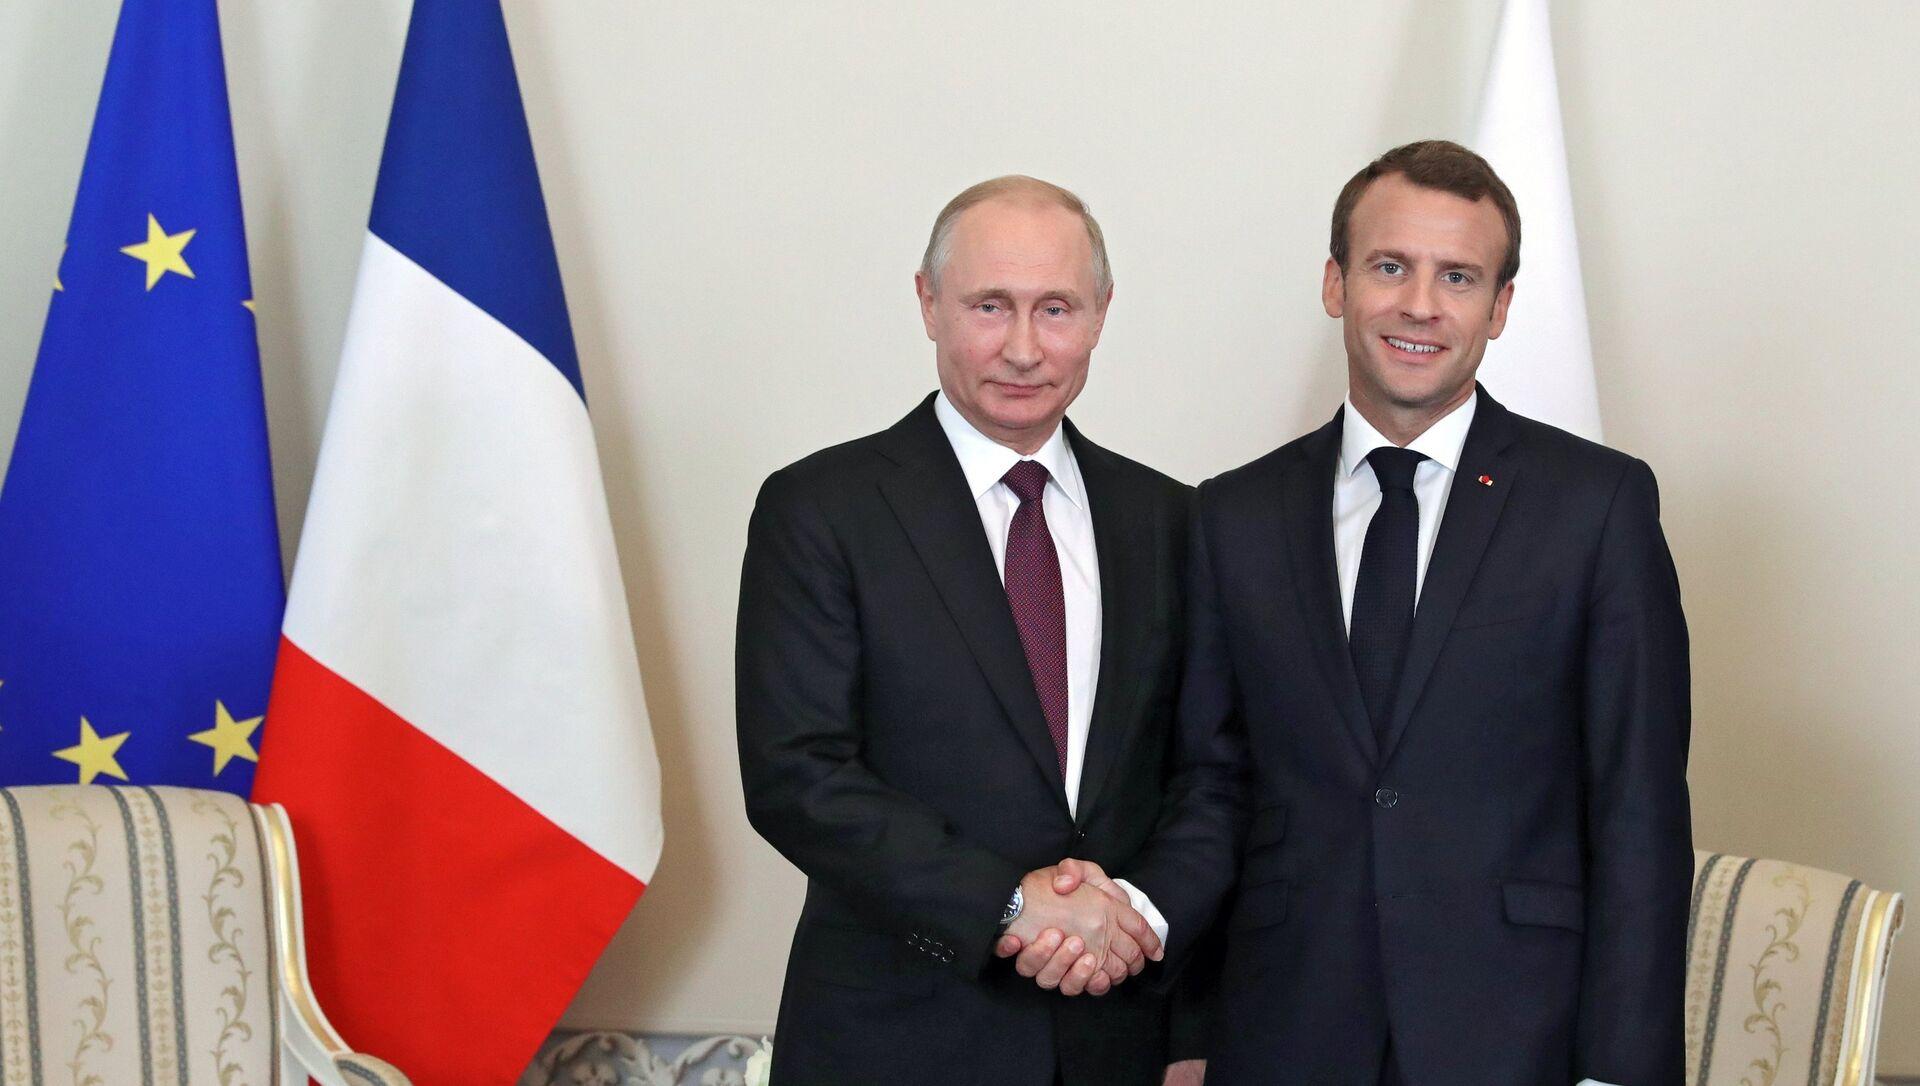 Vladímir Putin, presidente de Rusia, y Emmanuel Macron, presidente de Francia - Sputnik Mundo, 1920, 10.02.2021